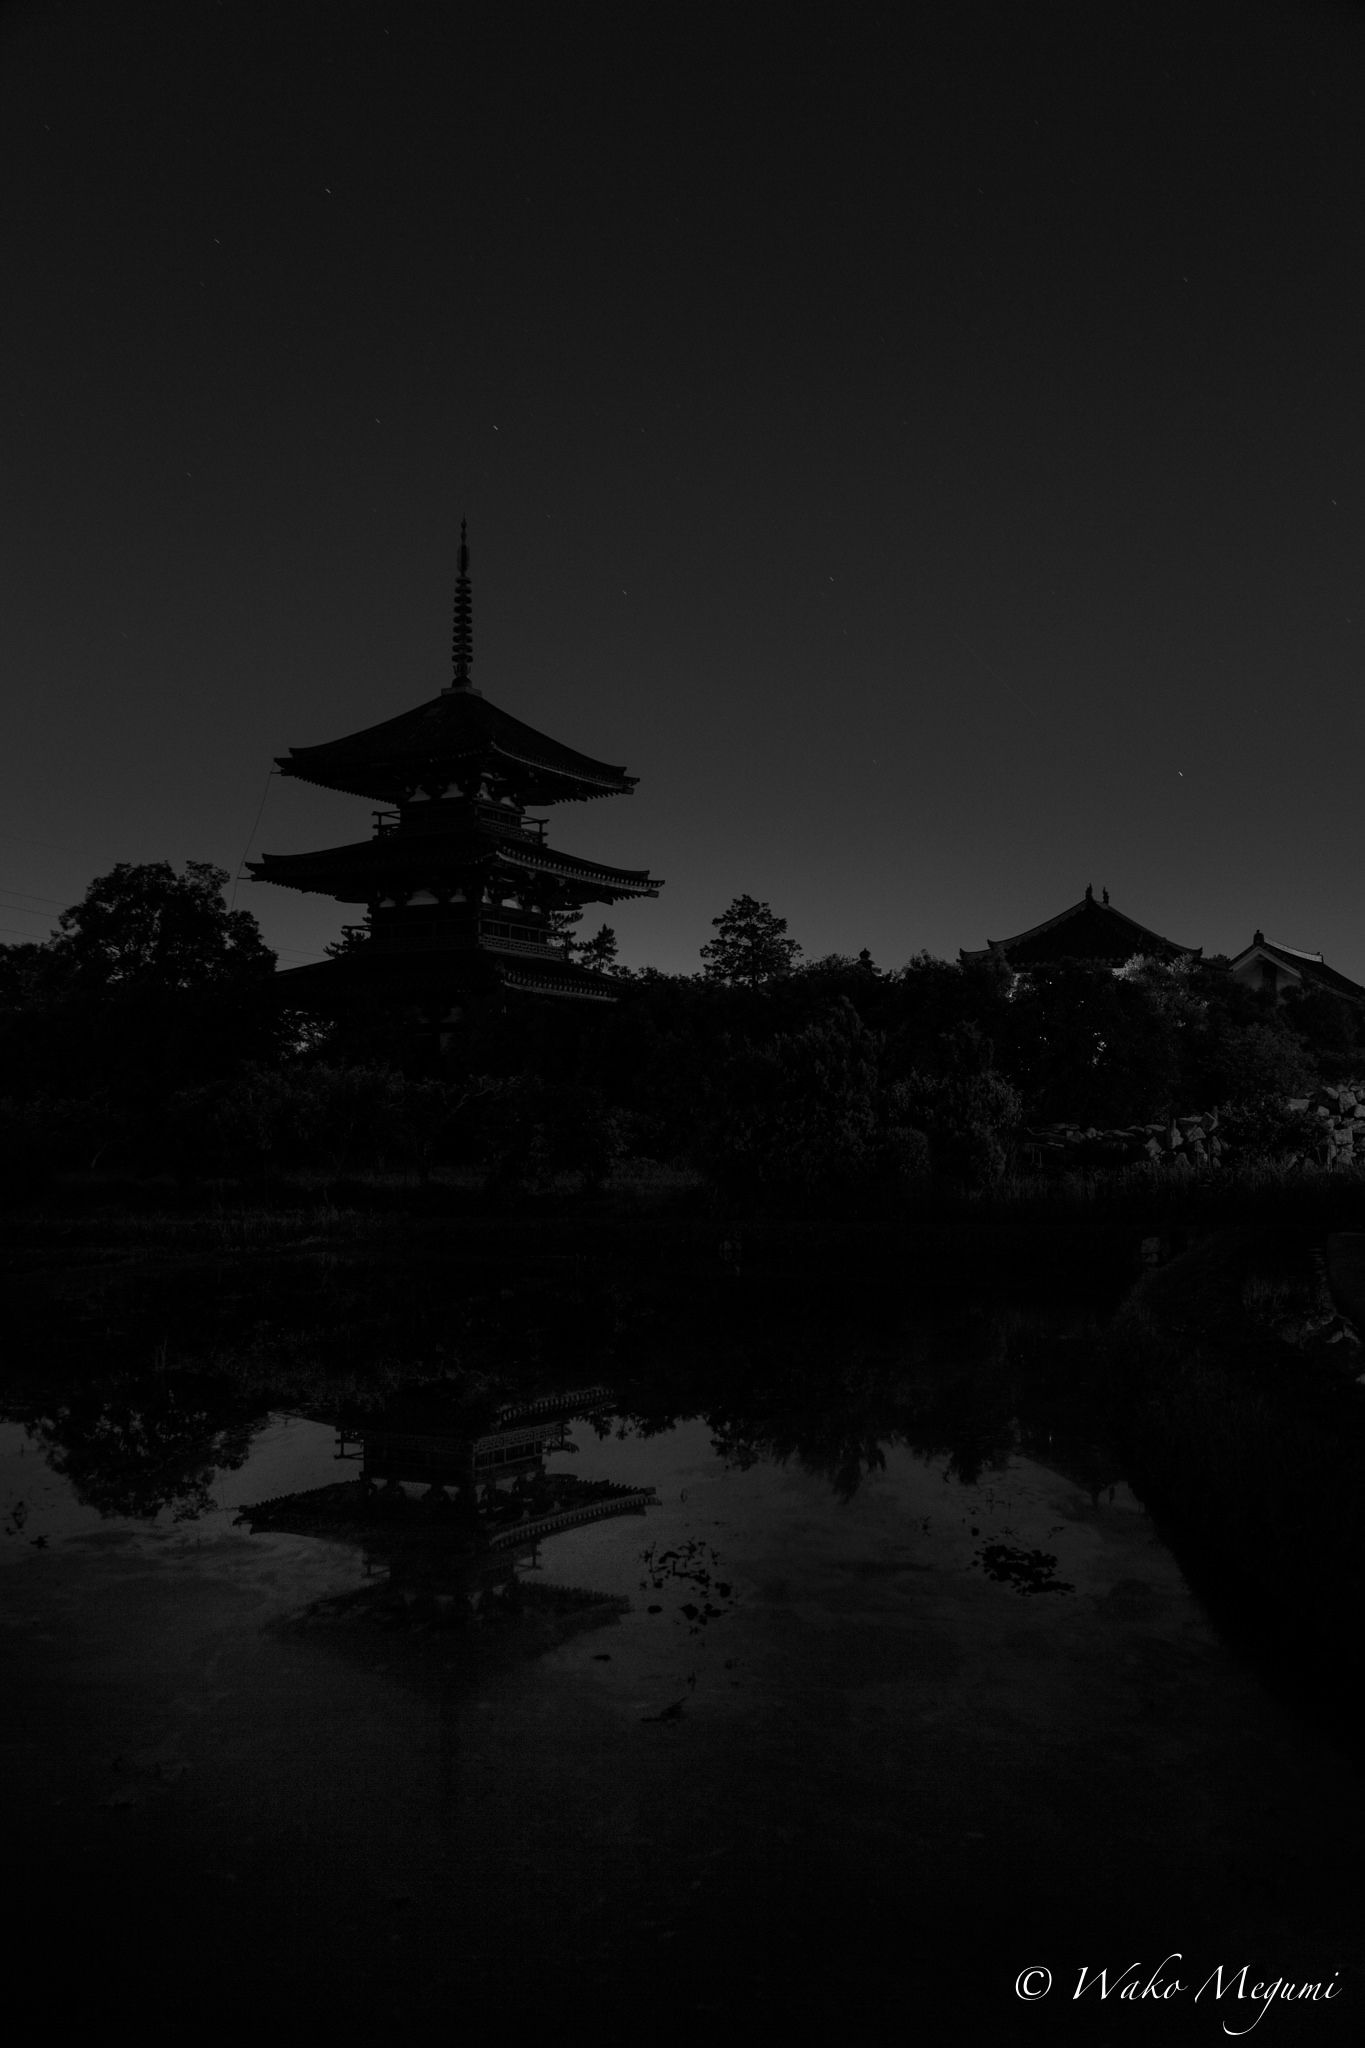 https://flic.kr/p/ntHCvx | 法起寺 夜景